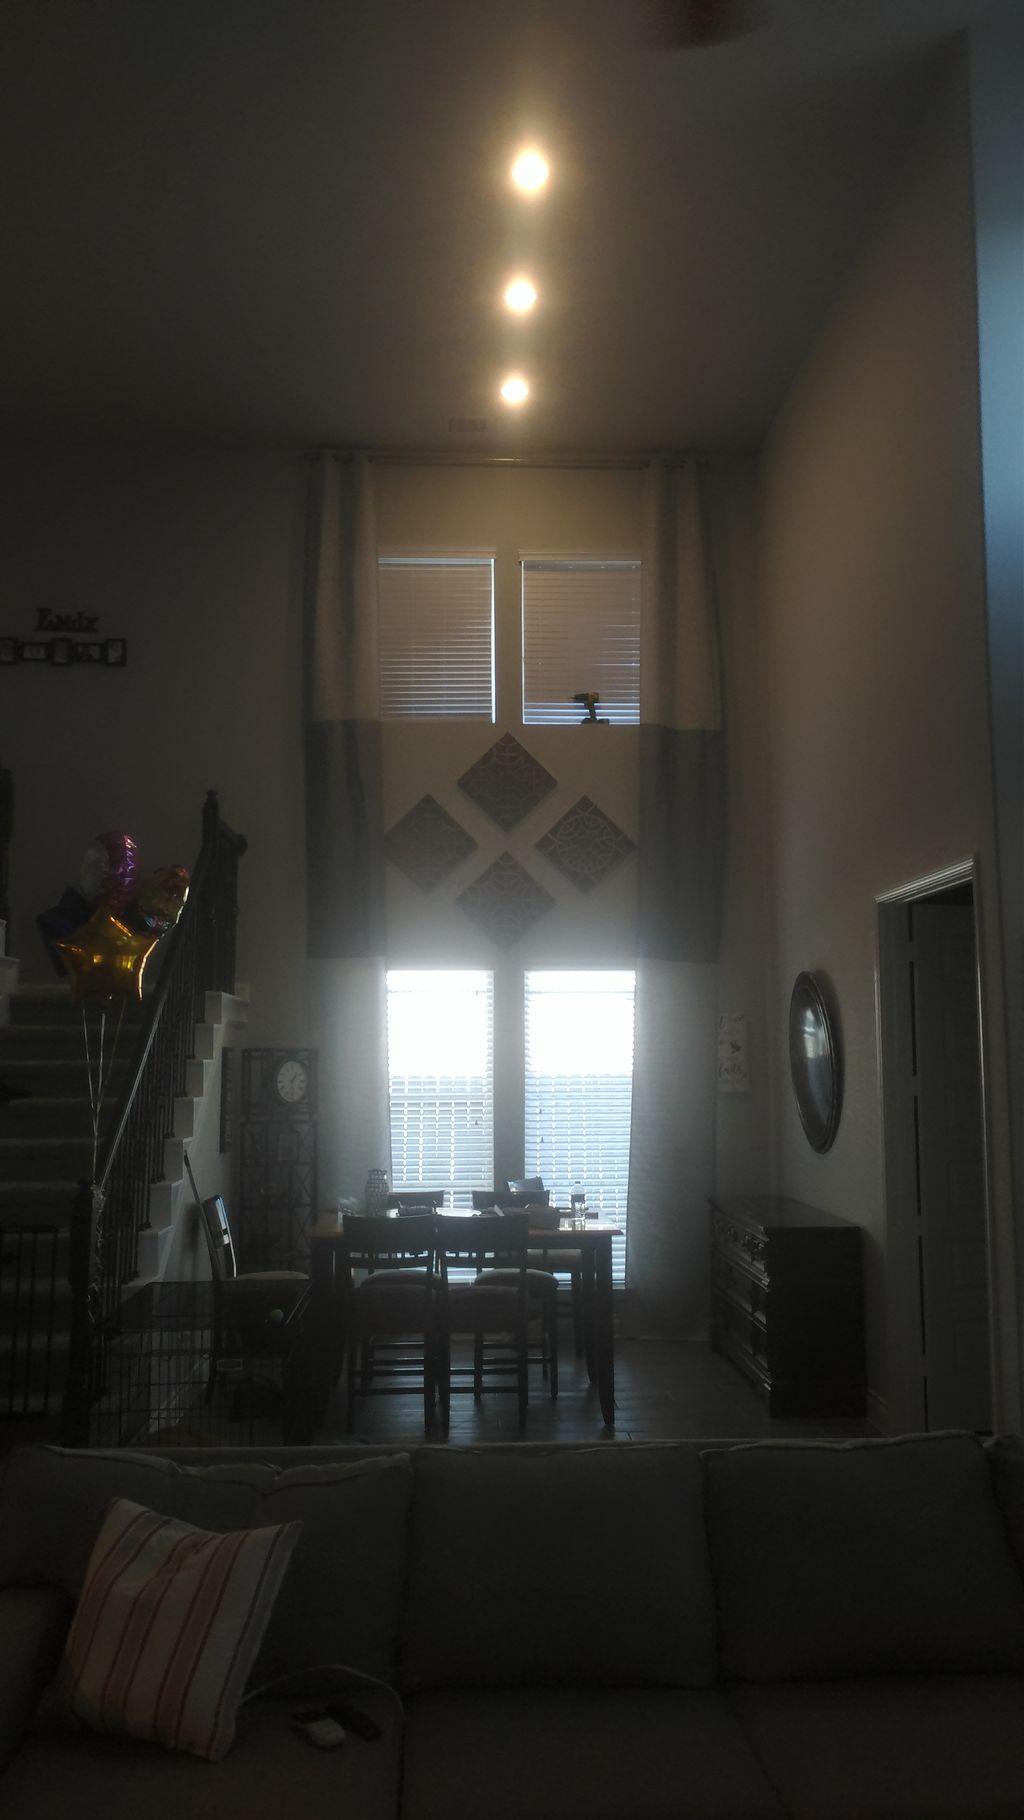 Window Treatment Installation or Repair - Fulshear 2020